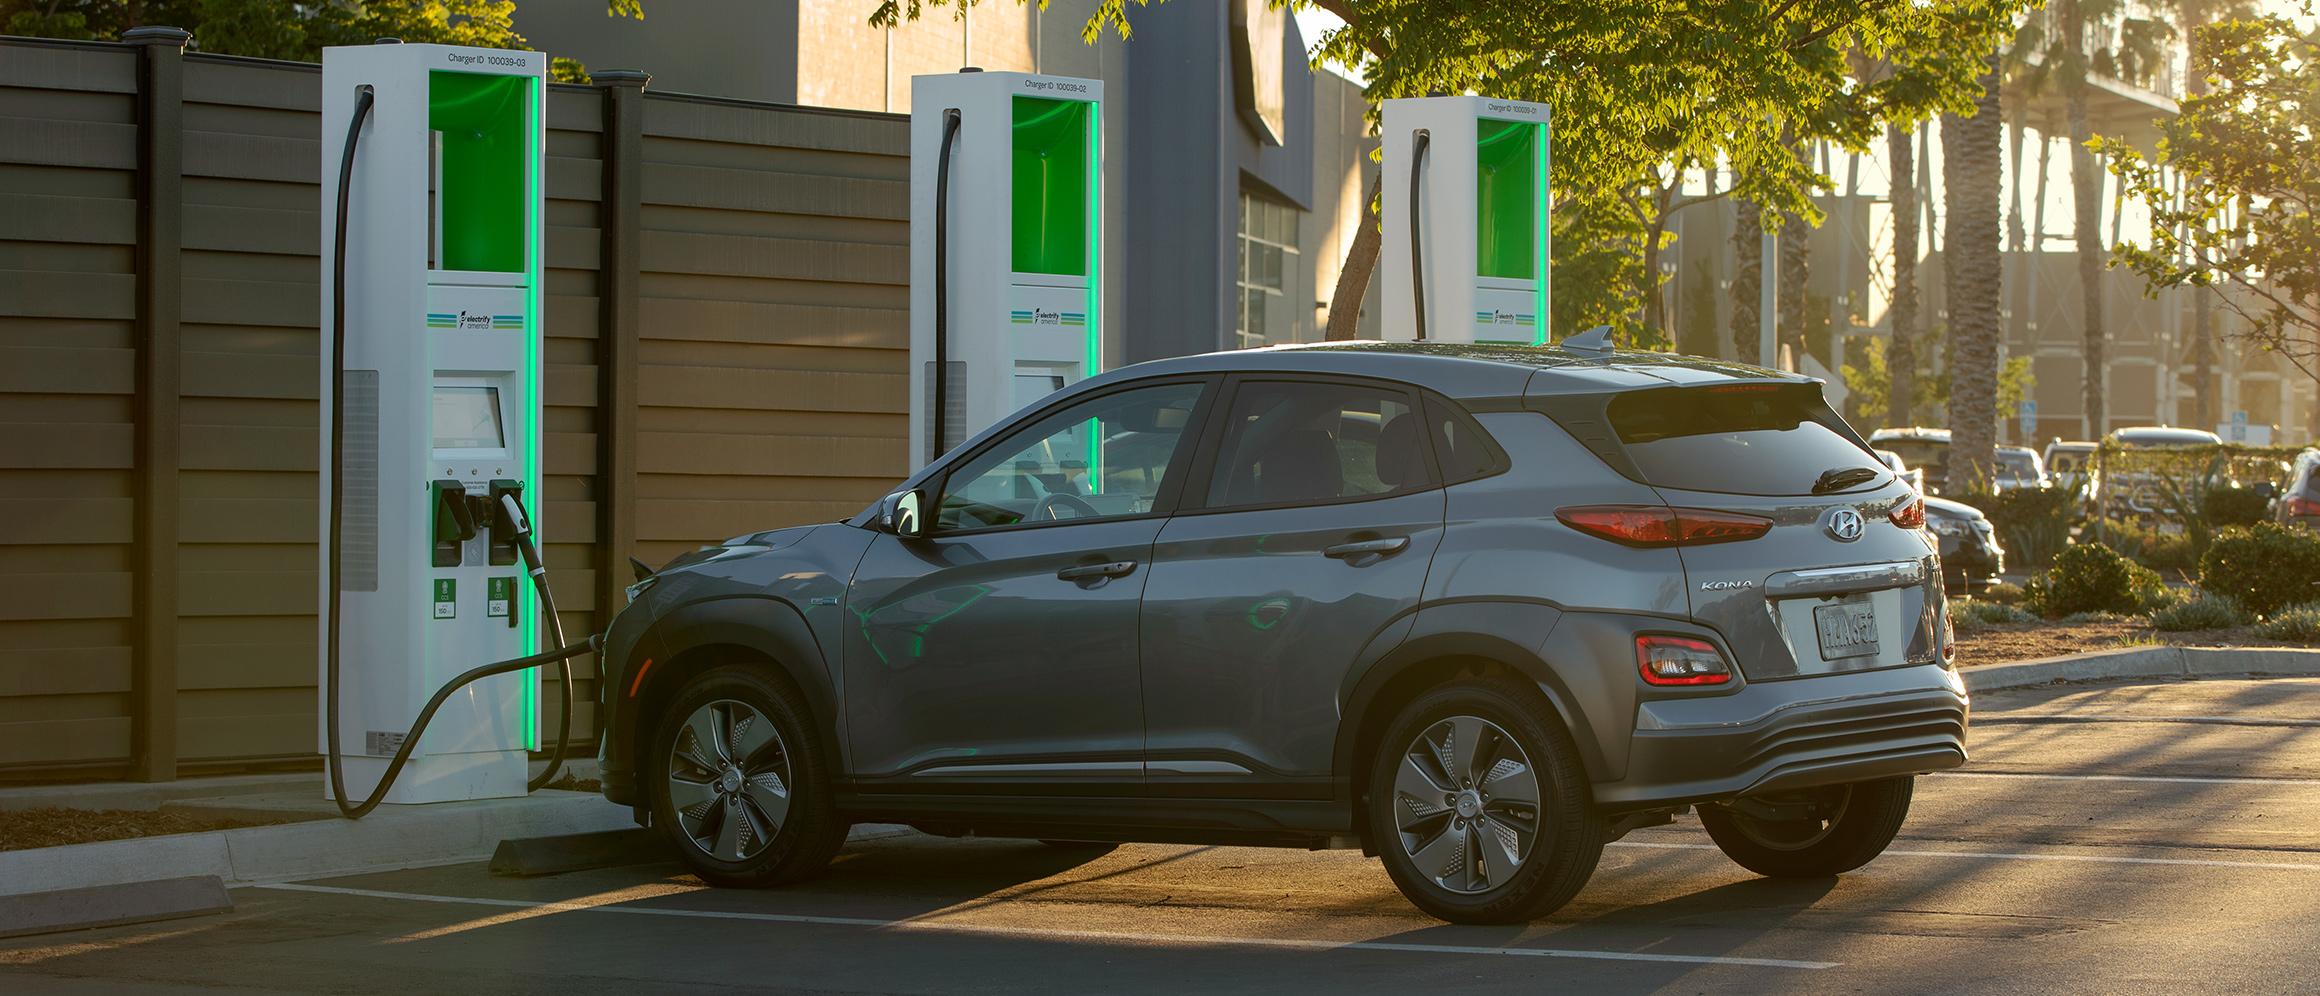 electrify america ev charging station